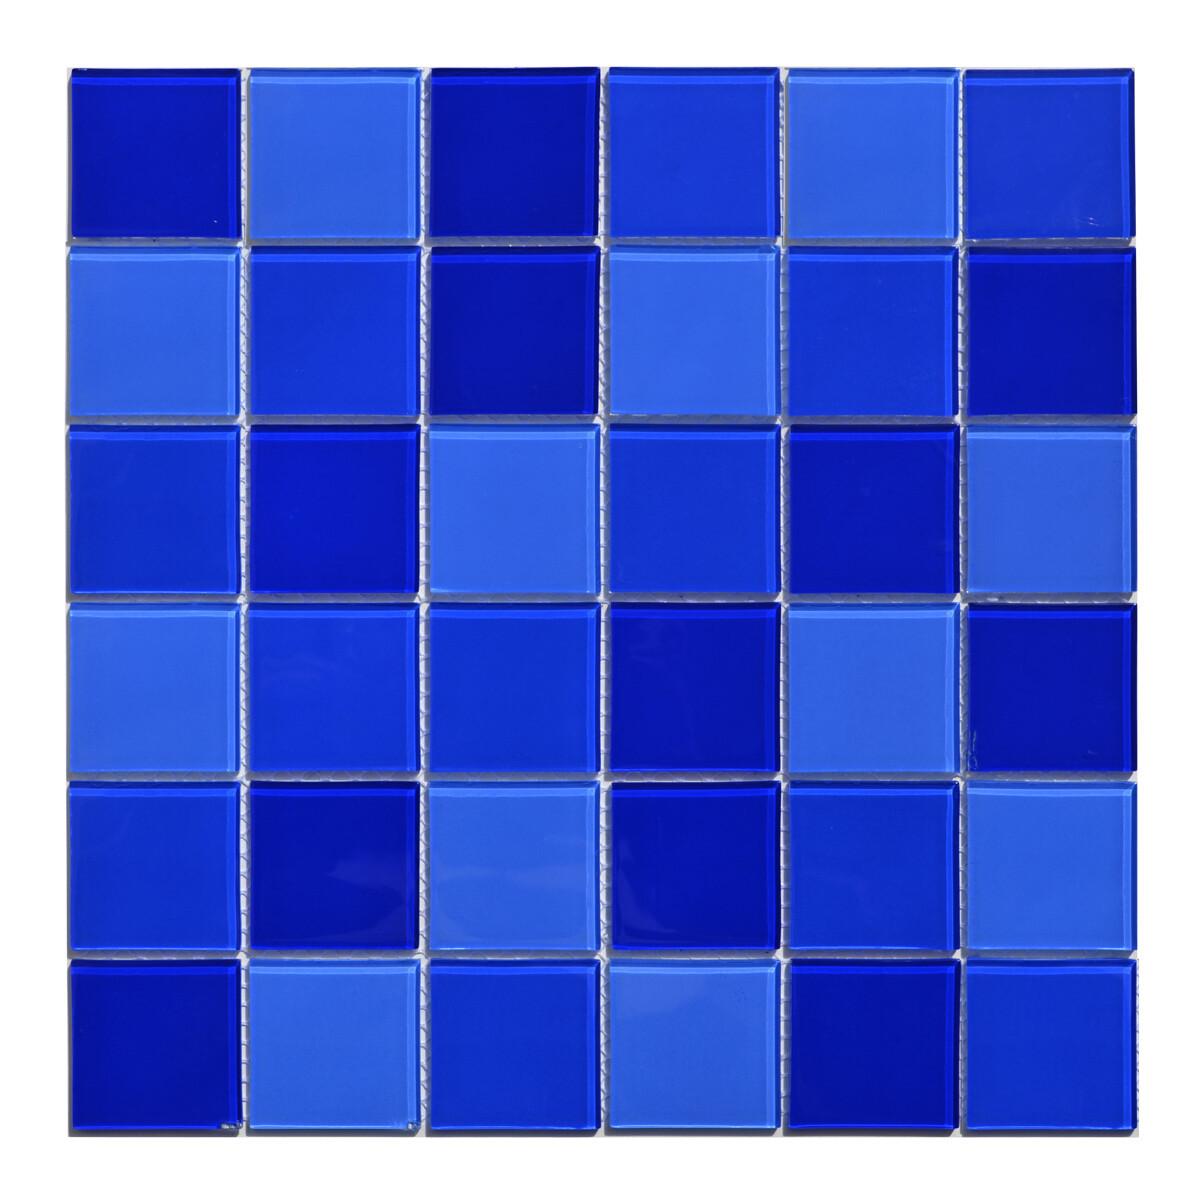 Мозаика стеклянная Aquaviva Cristall Dark Blue DCM306 (48 мм)